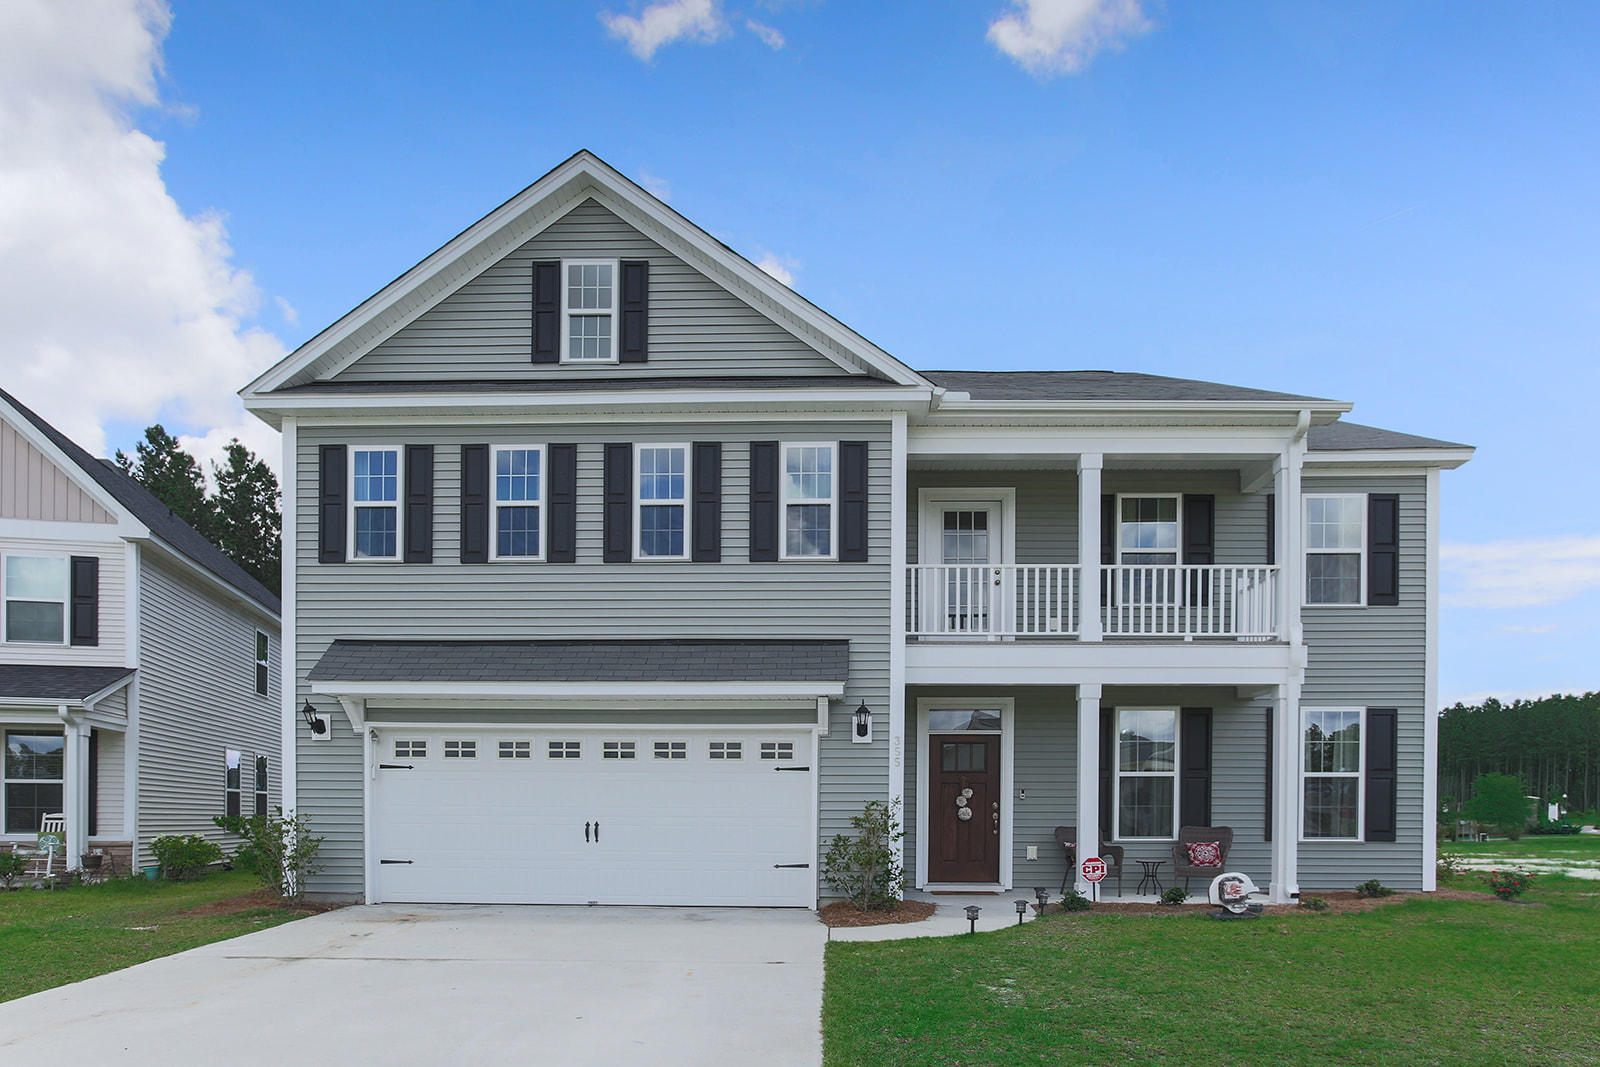 Cane Bay Plantation Homes For Sale - 355 Saxony, Summerville, SC - 5